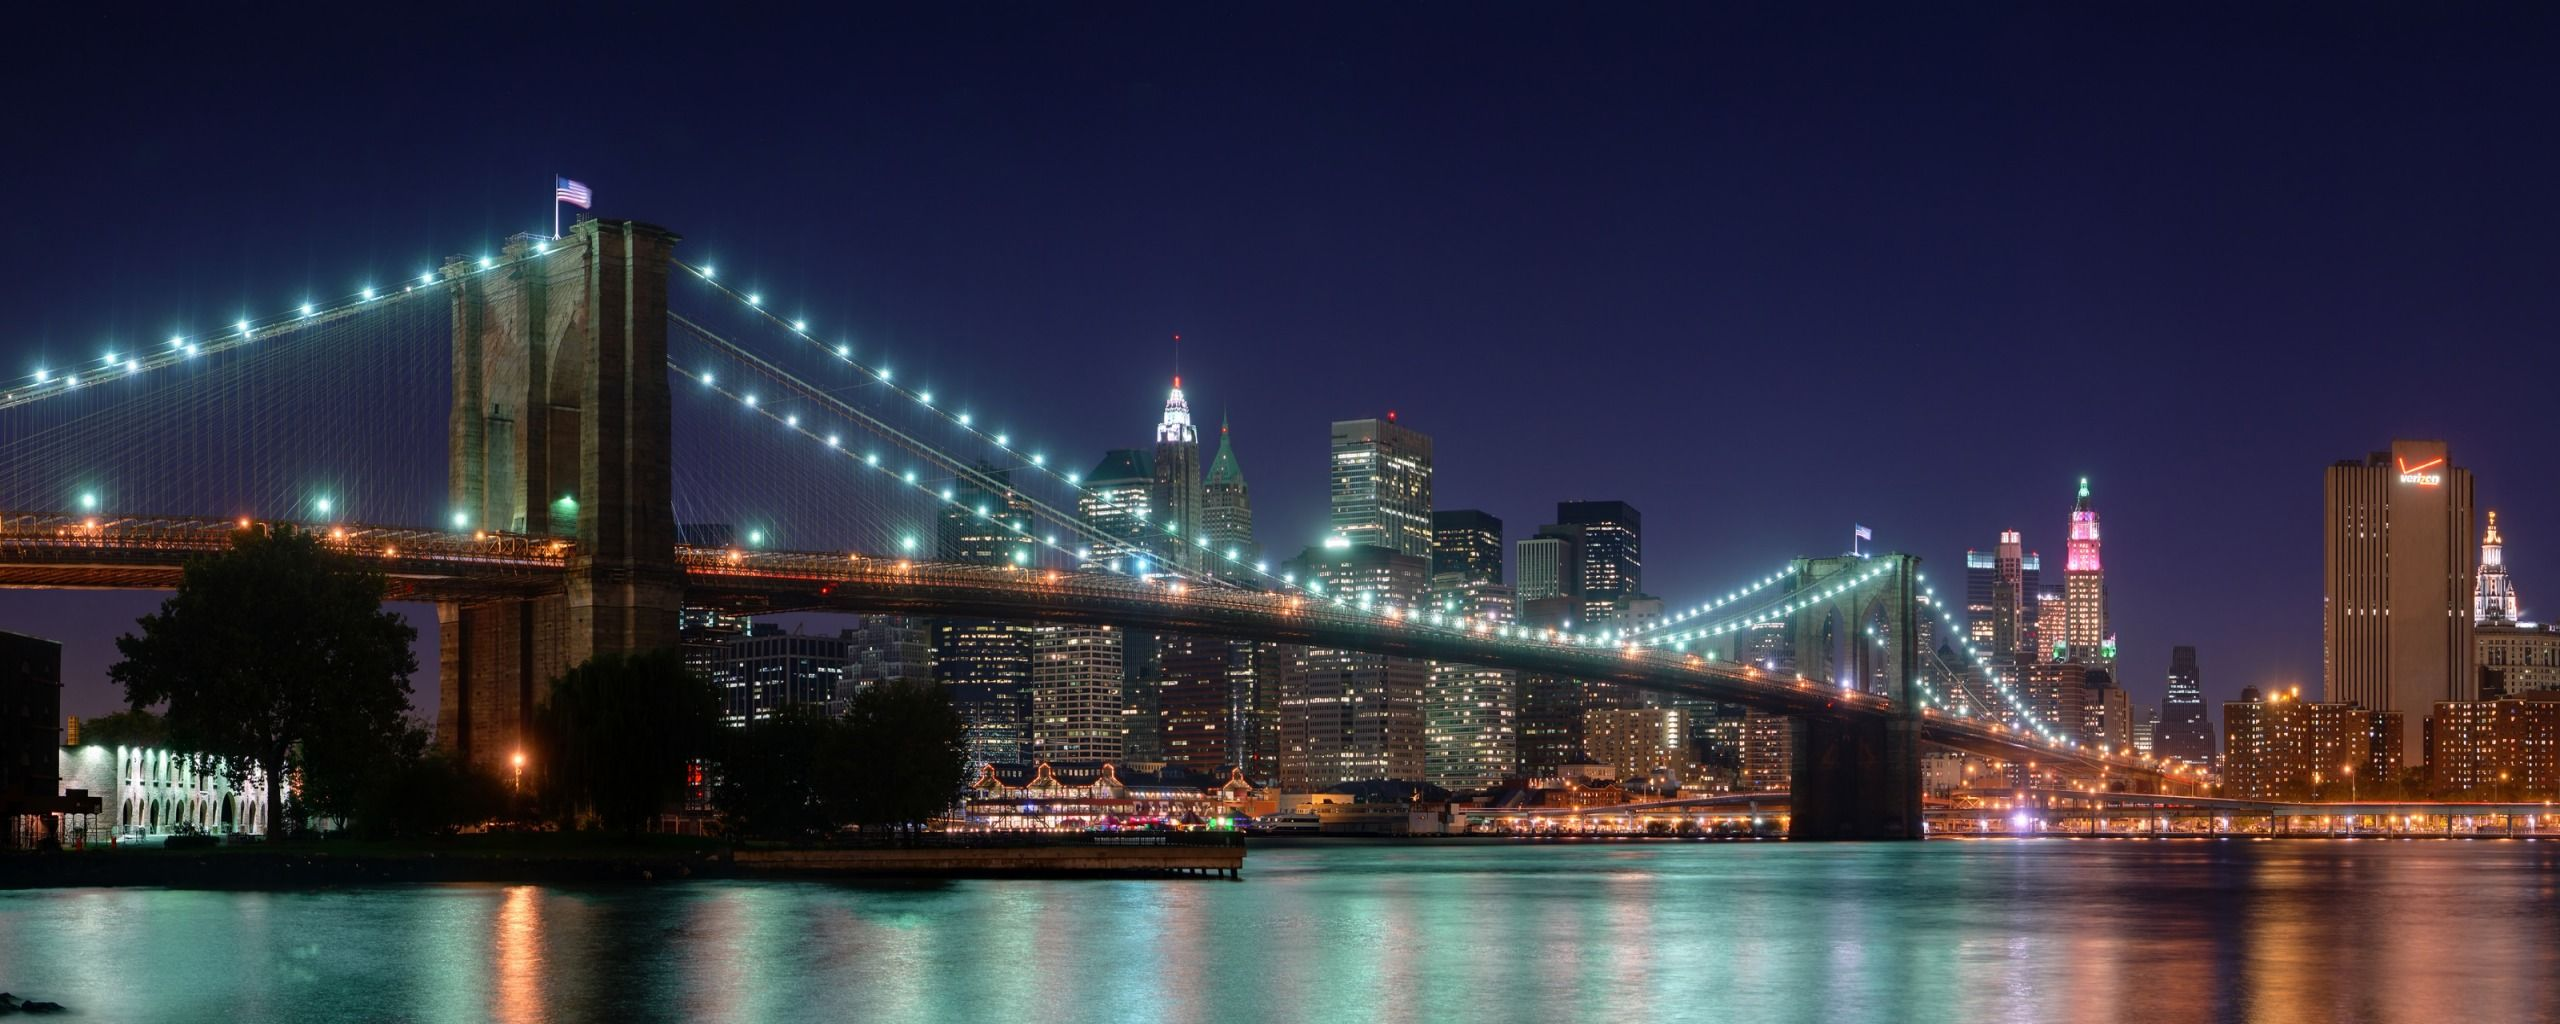 Google Image Result For Http Www Ventube Com Wp Content Uploads 2012 11 Hd Brooklyn Bridge Panor Bridge Wallpaper New York Landscape Brooklyn Bridge New York